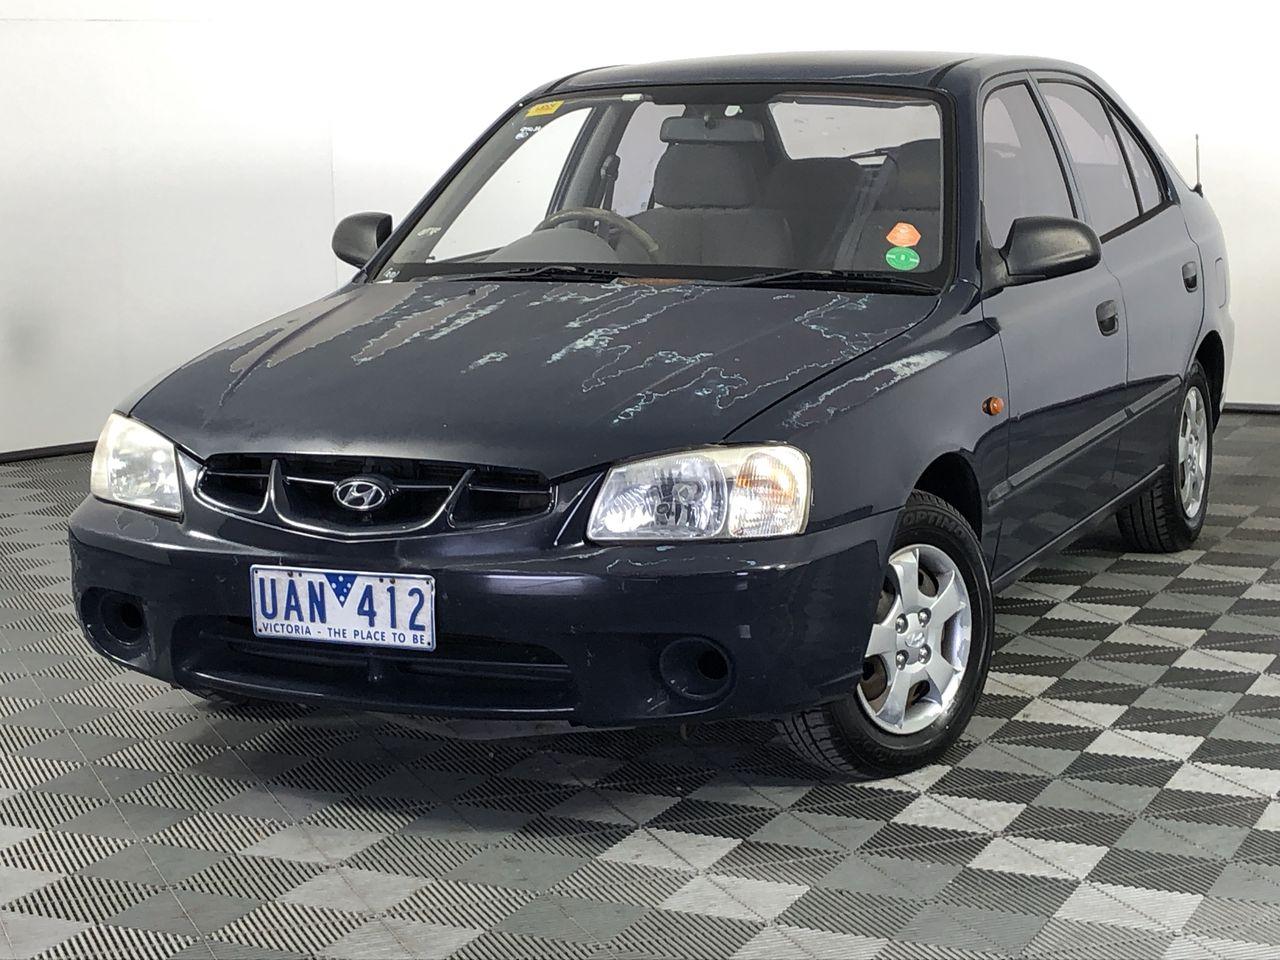 2001 Hyundai Accent GL LS Automatic Hatchback